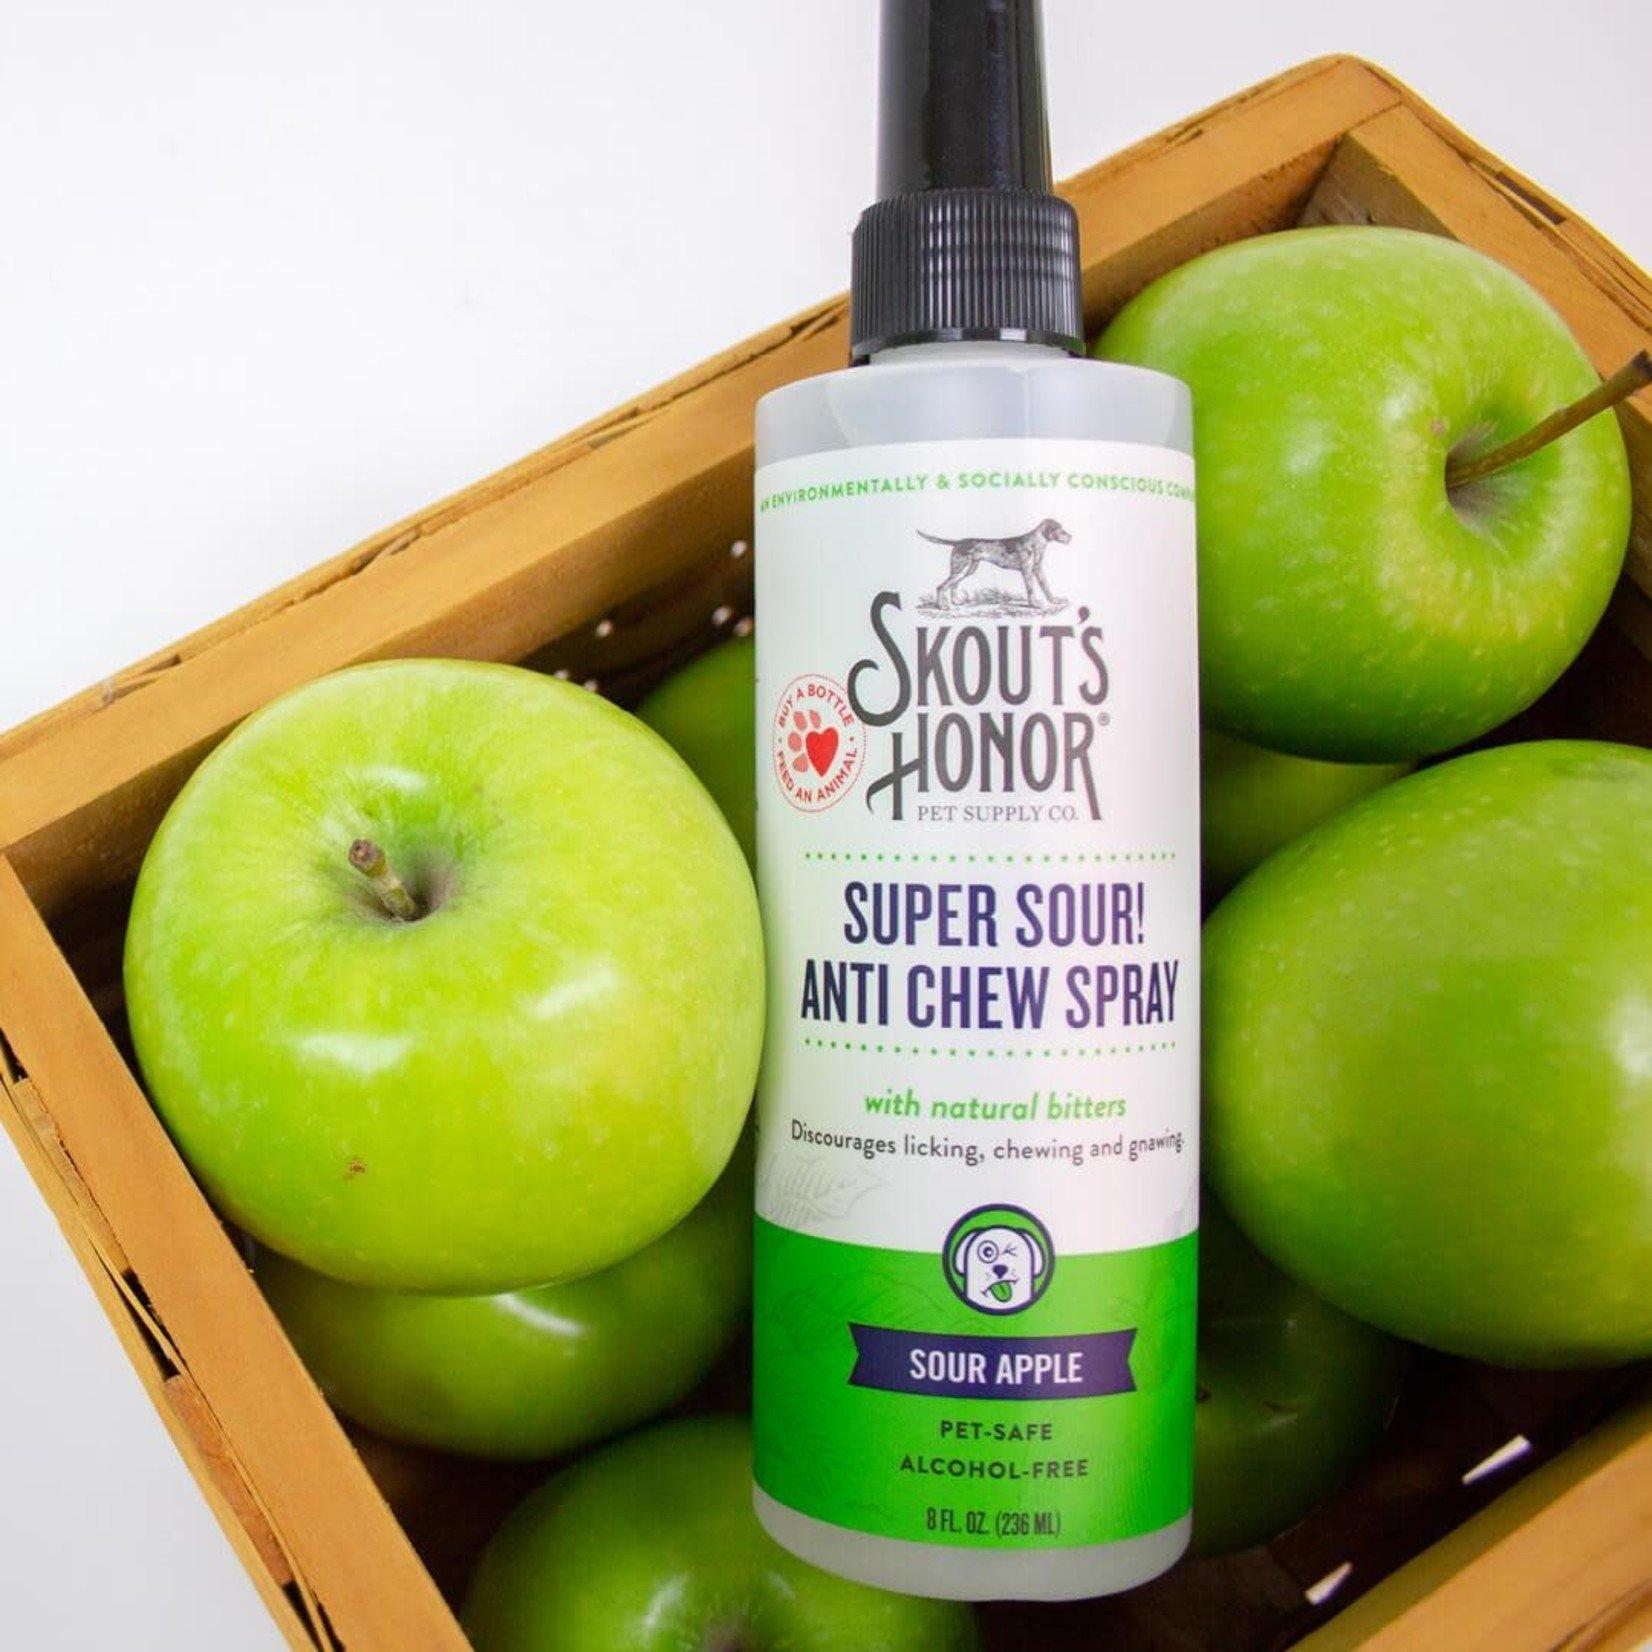 Skouts Honor Skouts Honor Anti-Chew Spray Sour Apple 8 OZ